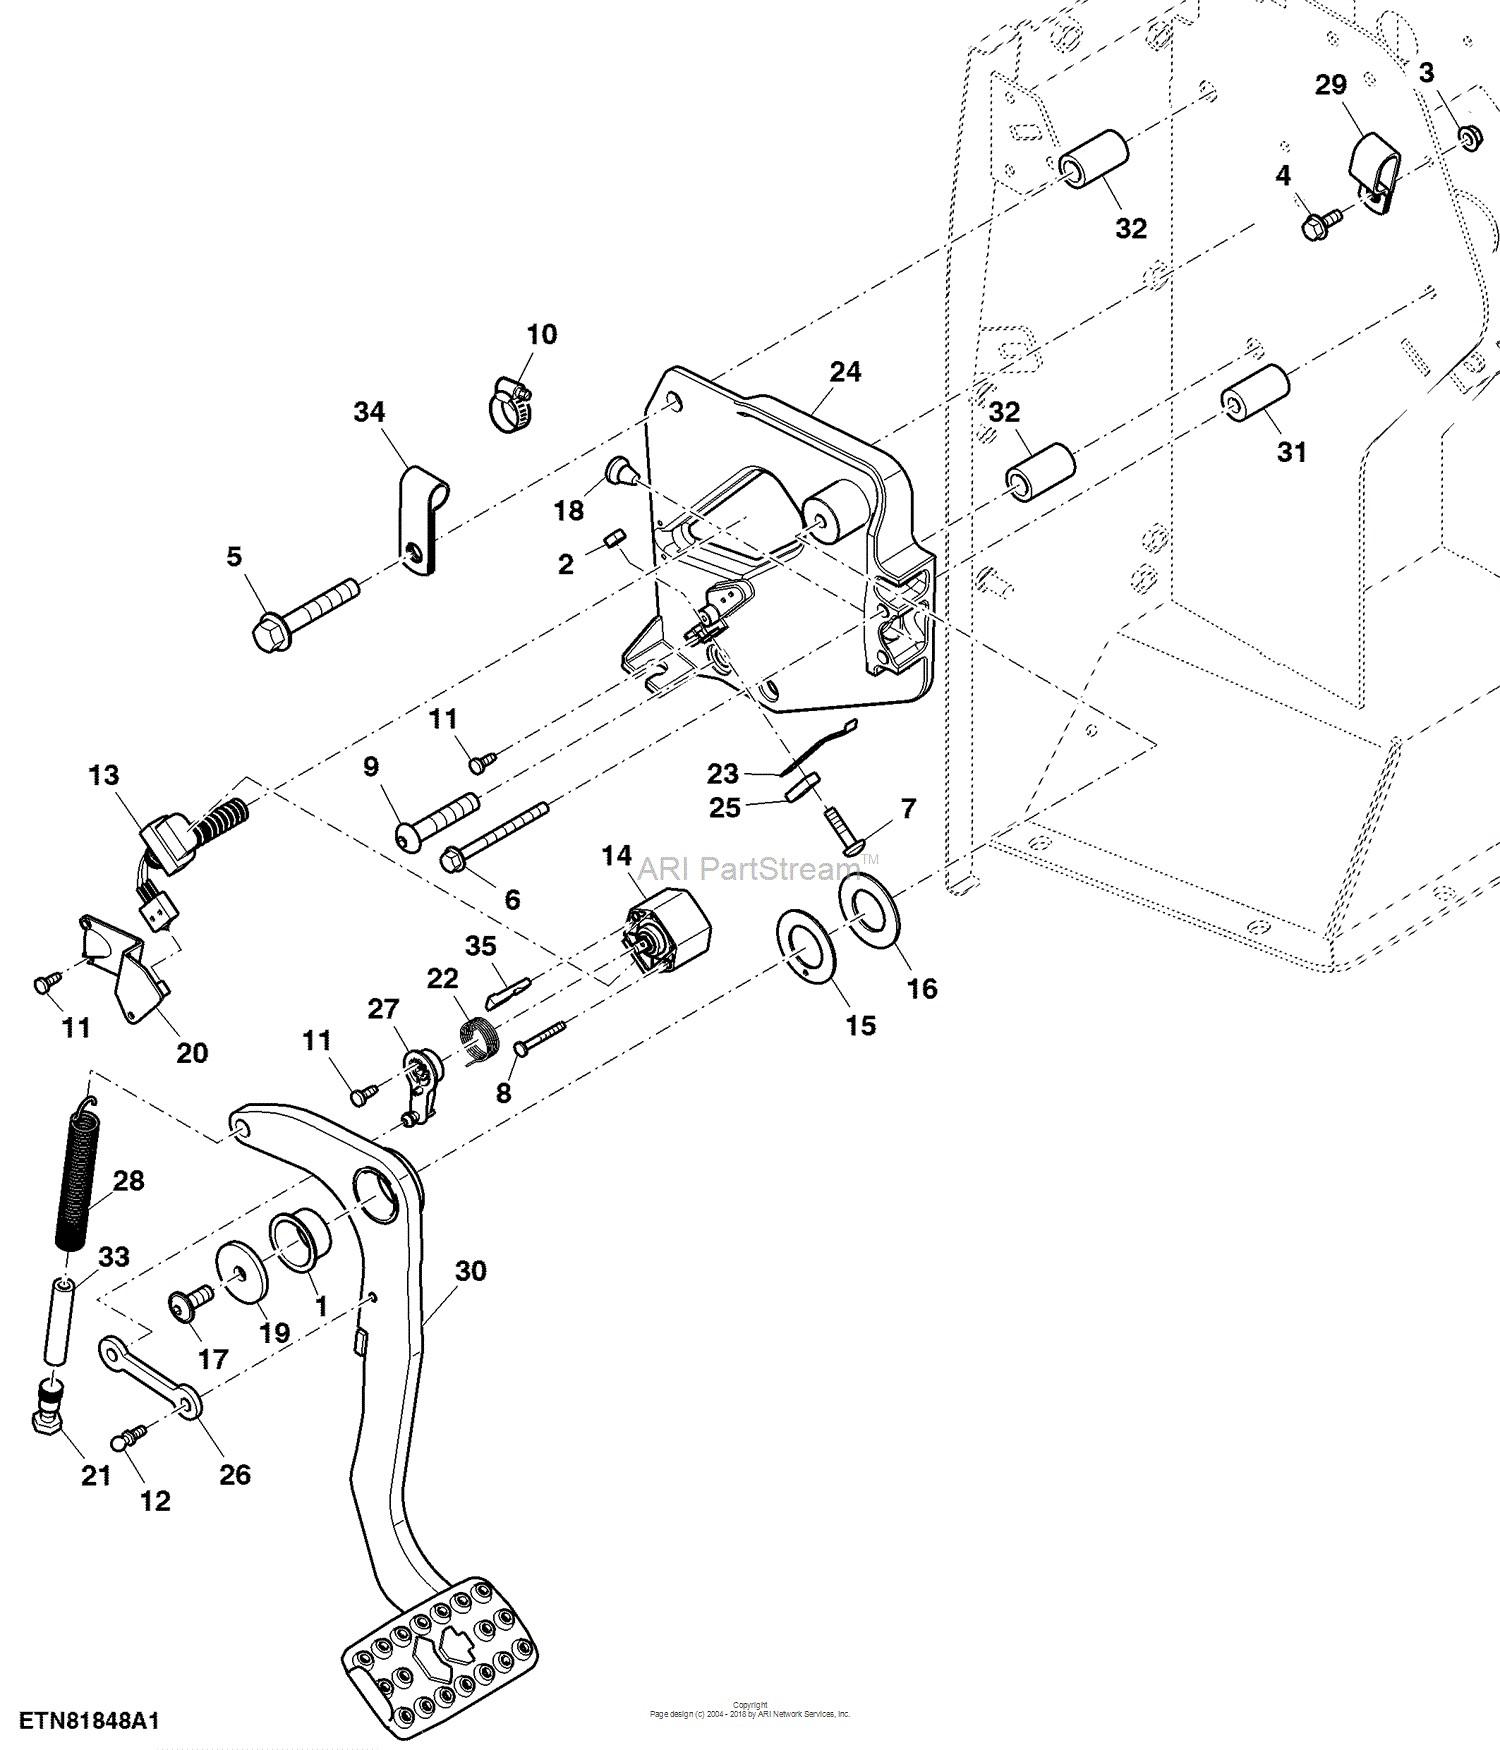 Car Clutch assembly Diagram John Deere Parts Diagrams John Deere 5085e Tractor Pc Clutch Of Car Clutch assembly Diagram Gearbox Clutch and Propshaft